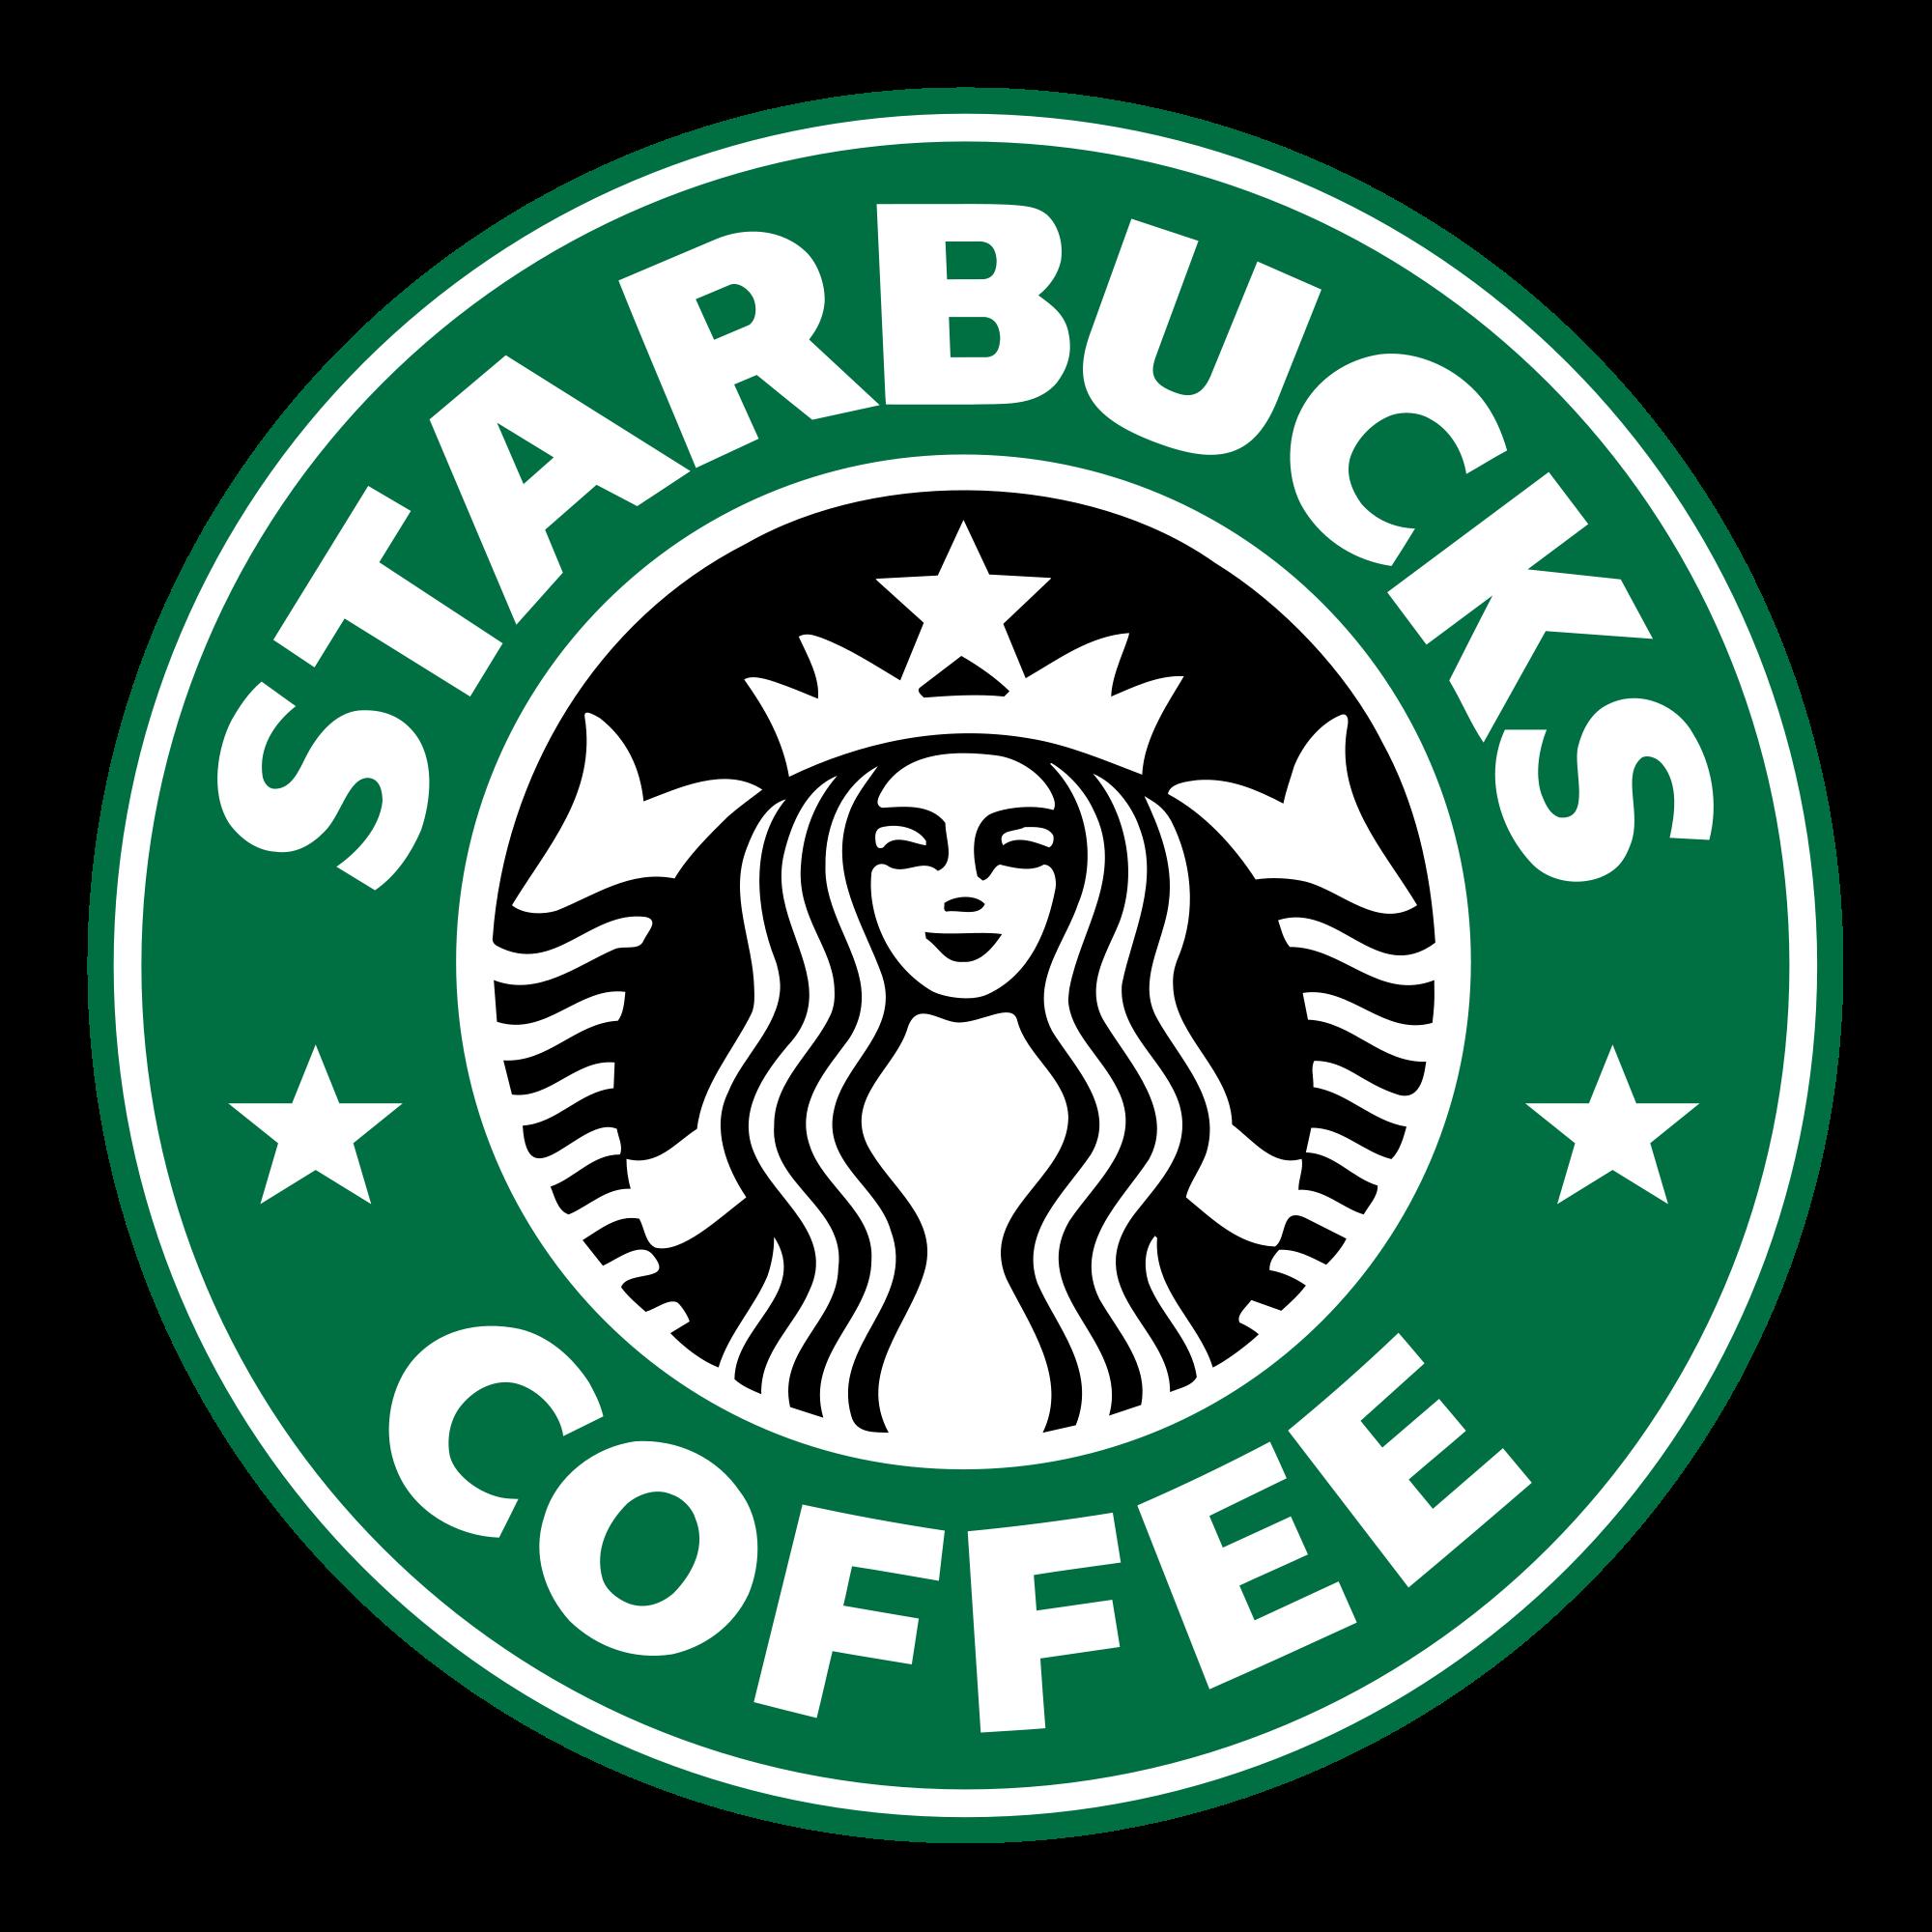 Starbucks clipart logo starbucks. Silhouette at getdrawings com